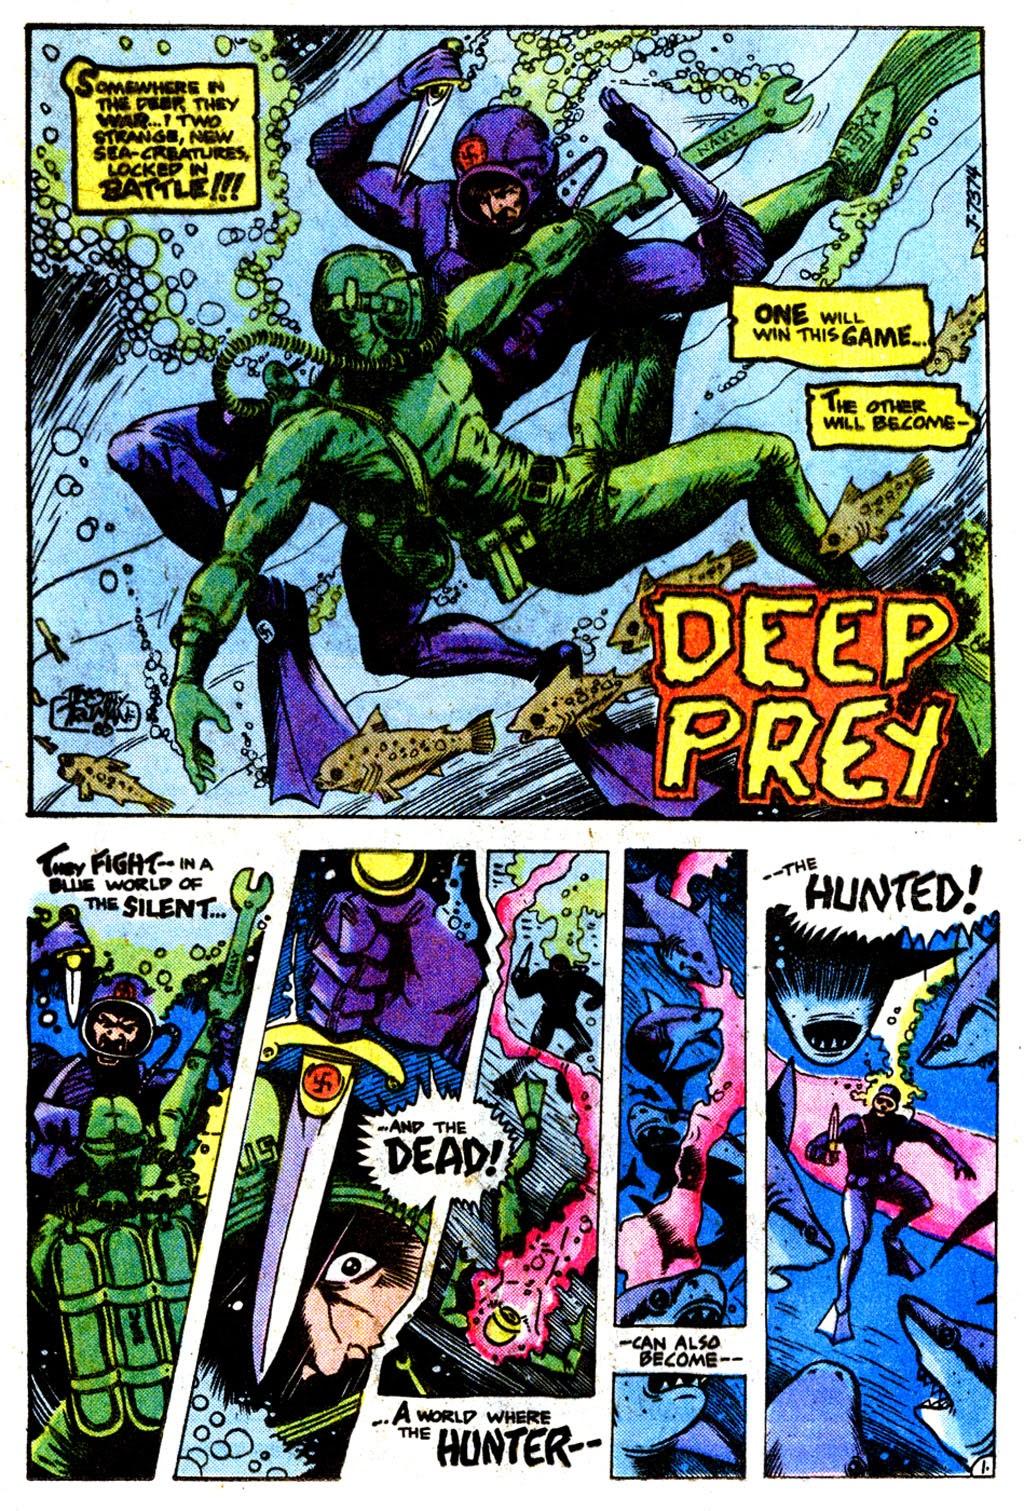 Read online Sgt. Rock comic -  Issue #358 - 16